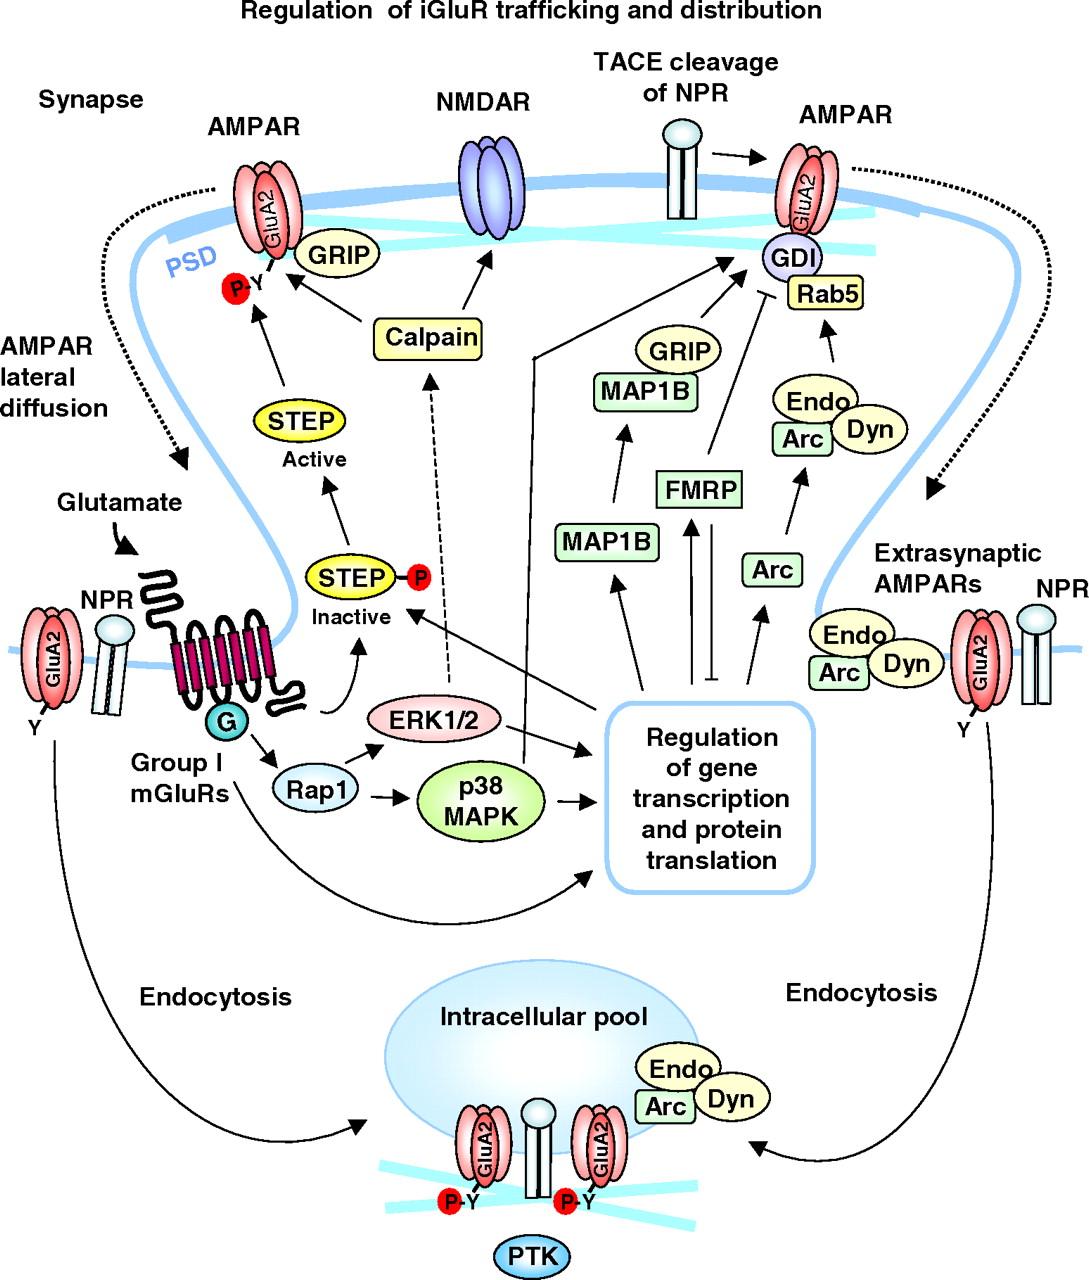 metabotropic glutamate receptor mediated long term depressionfig 1